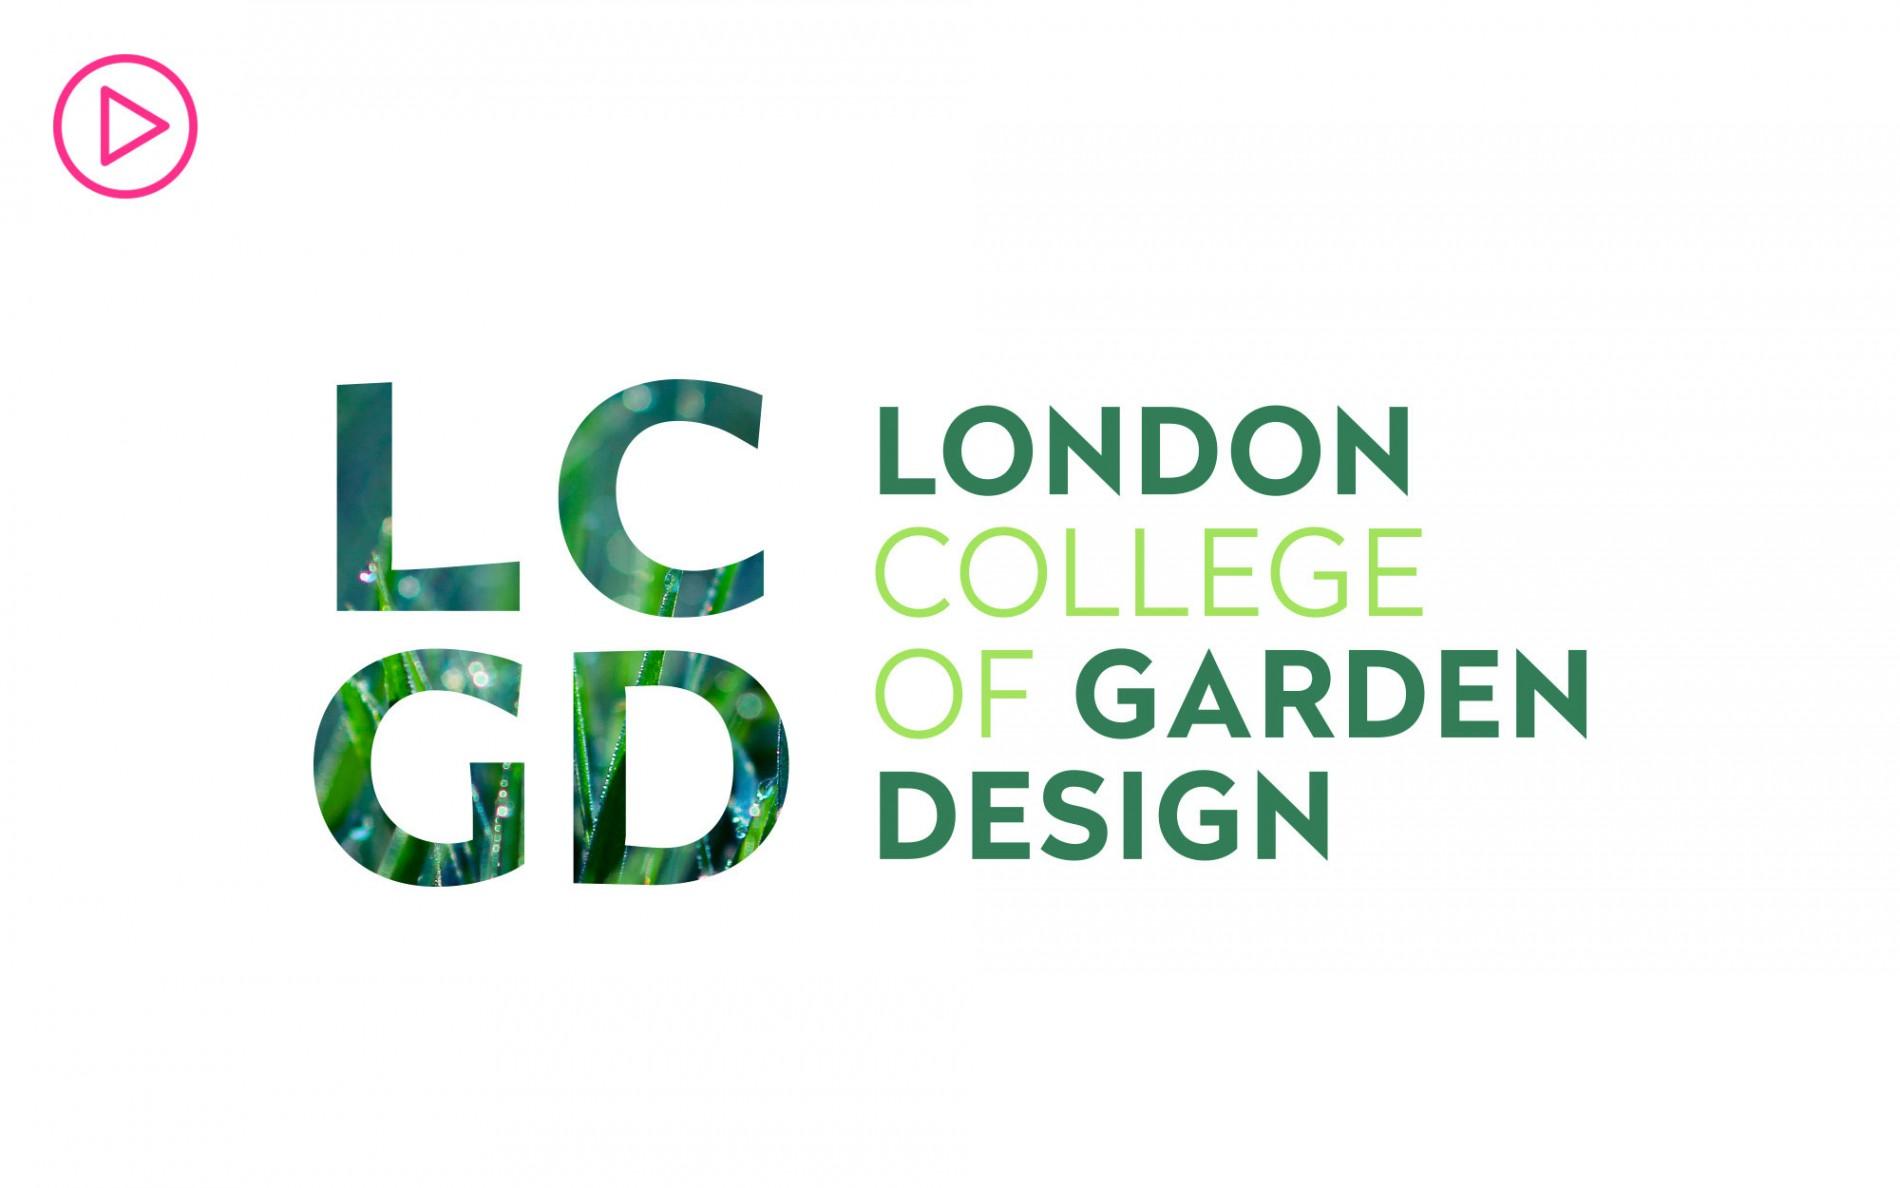 rebranding of the london college of garden design